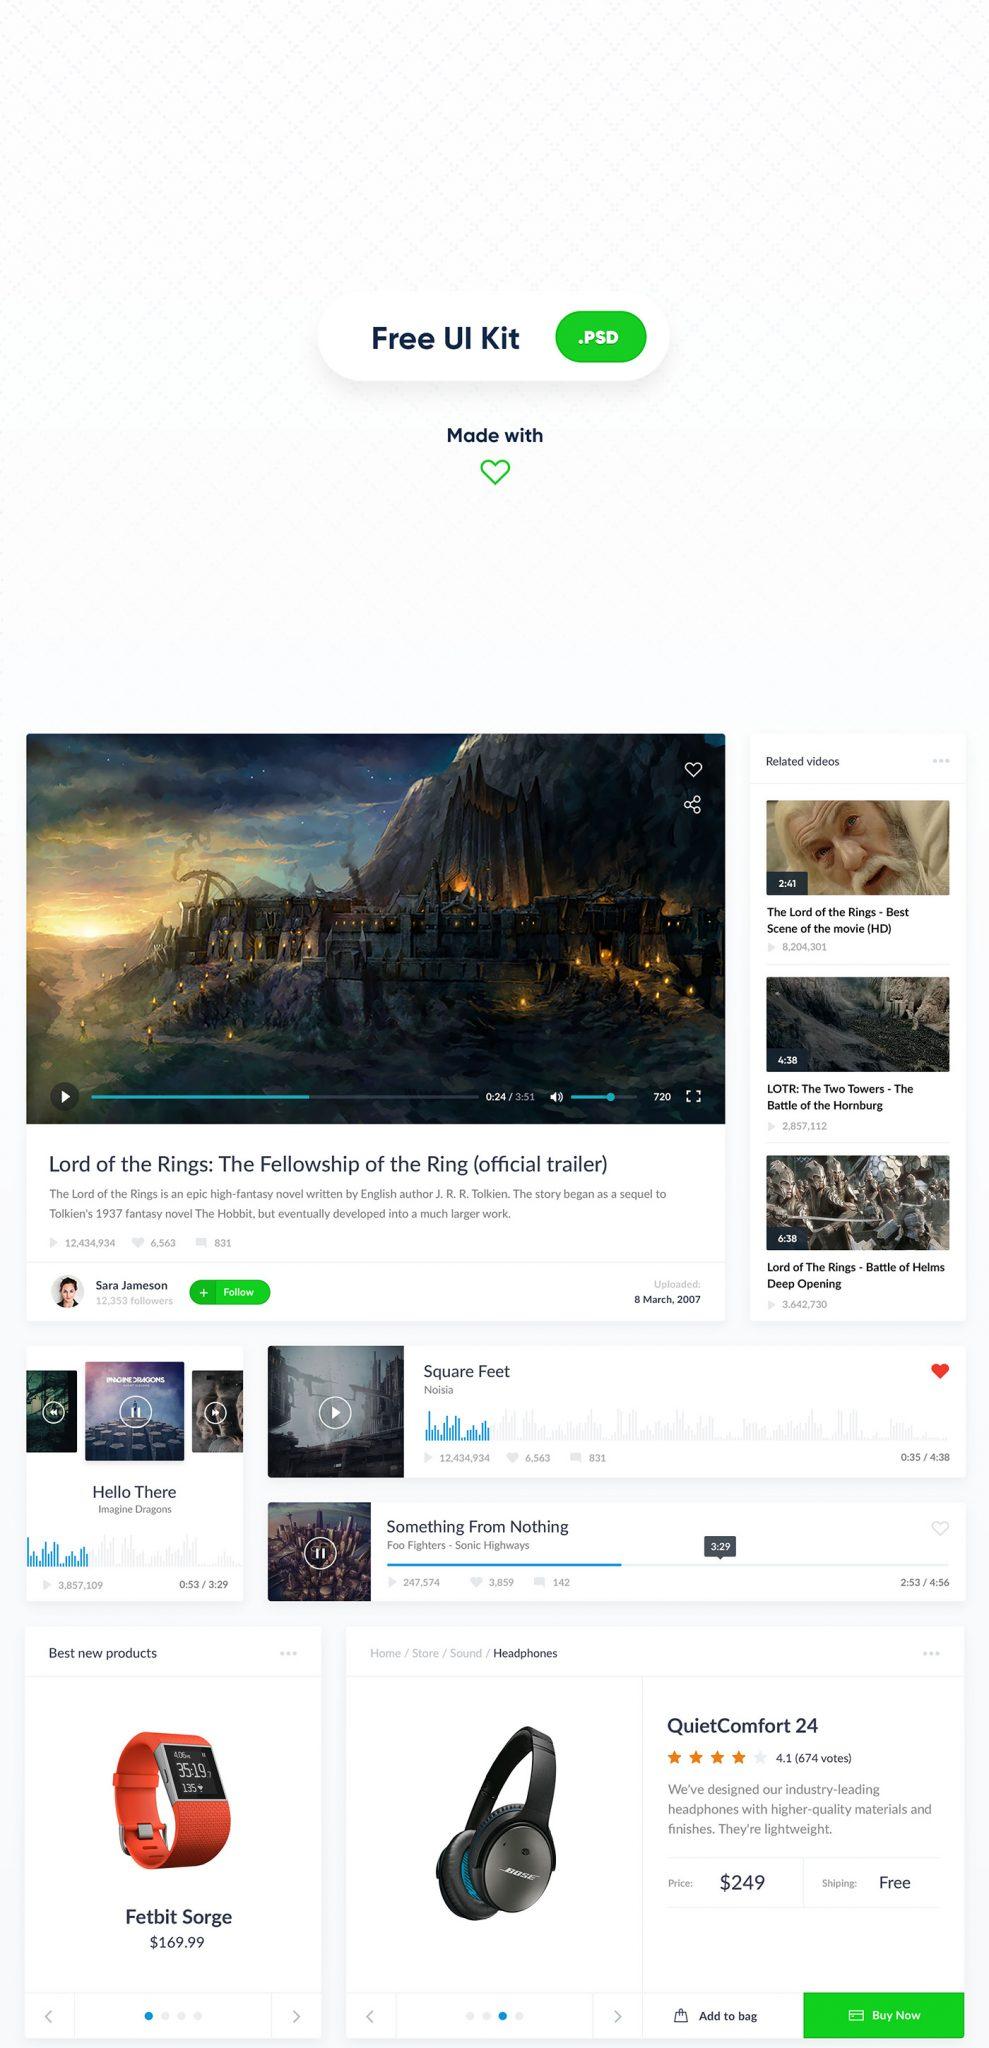 Free Website UI Kit - Sliders, Feature images, categories - freebie